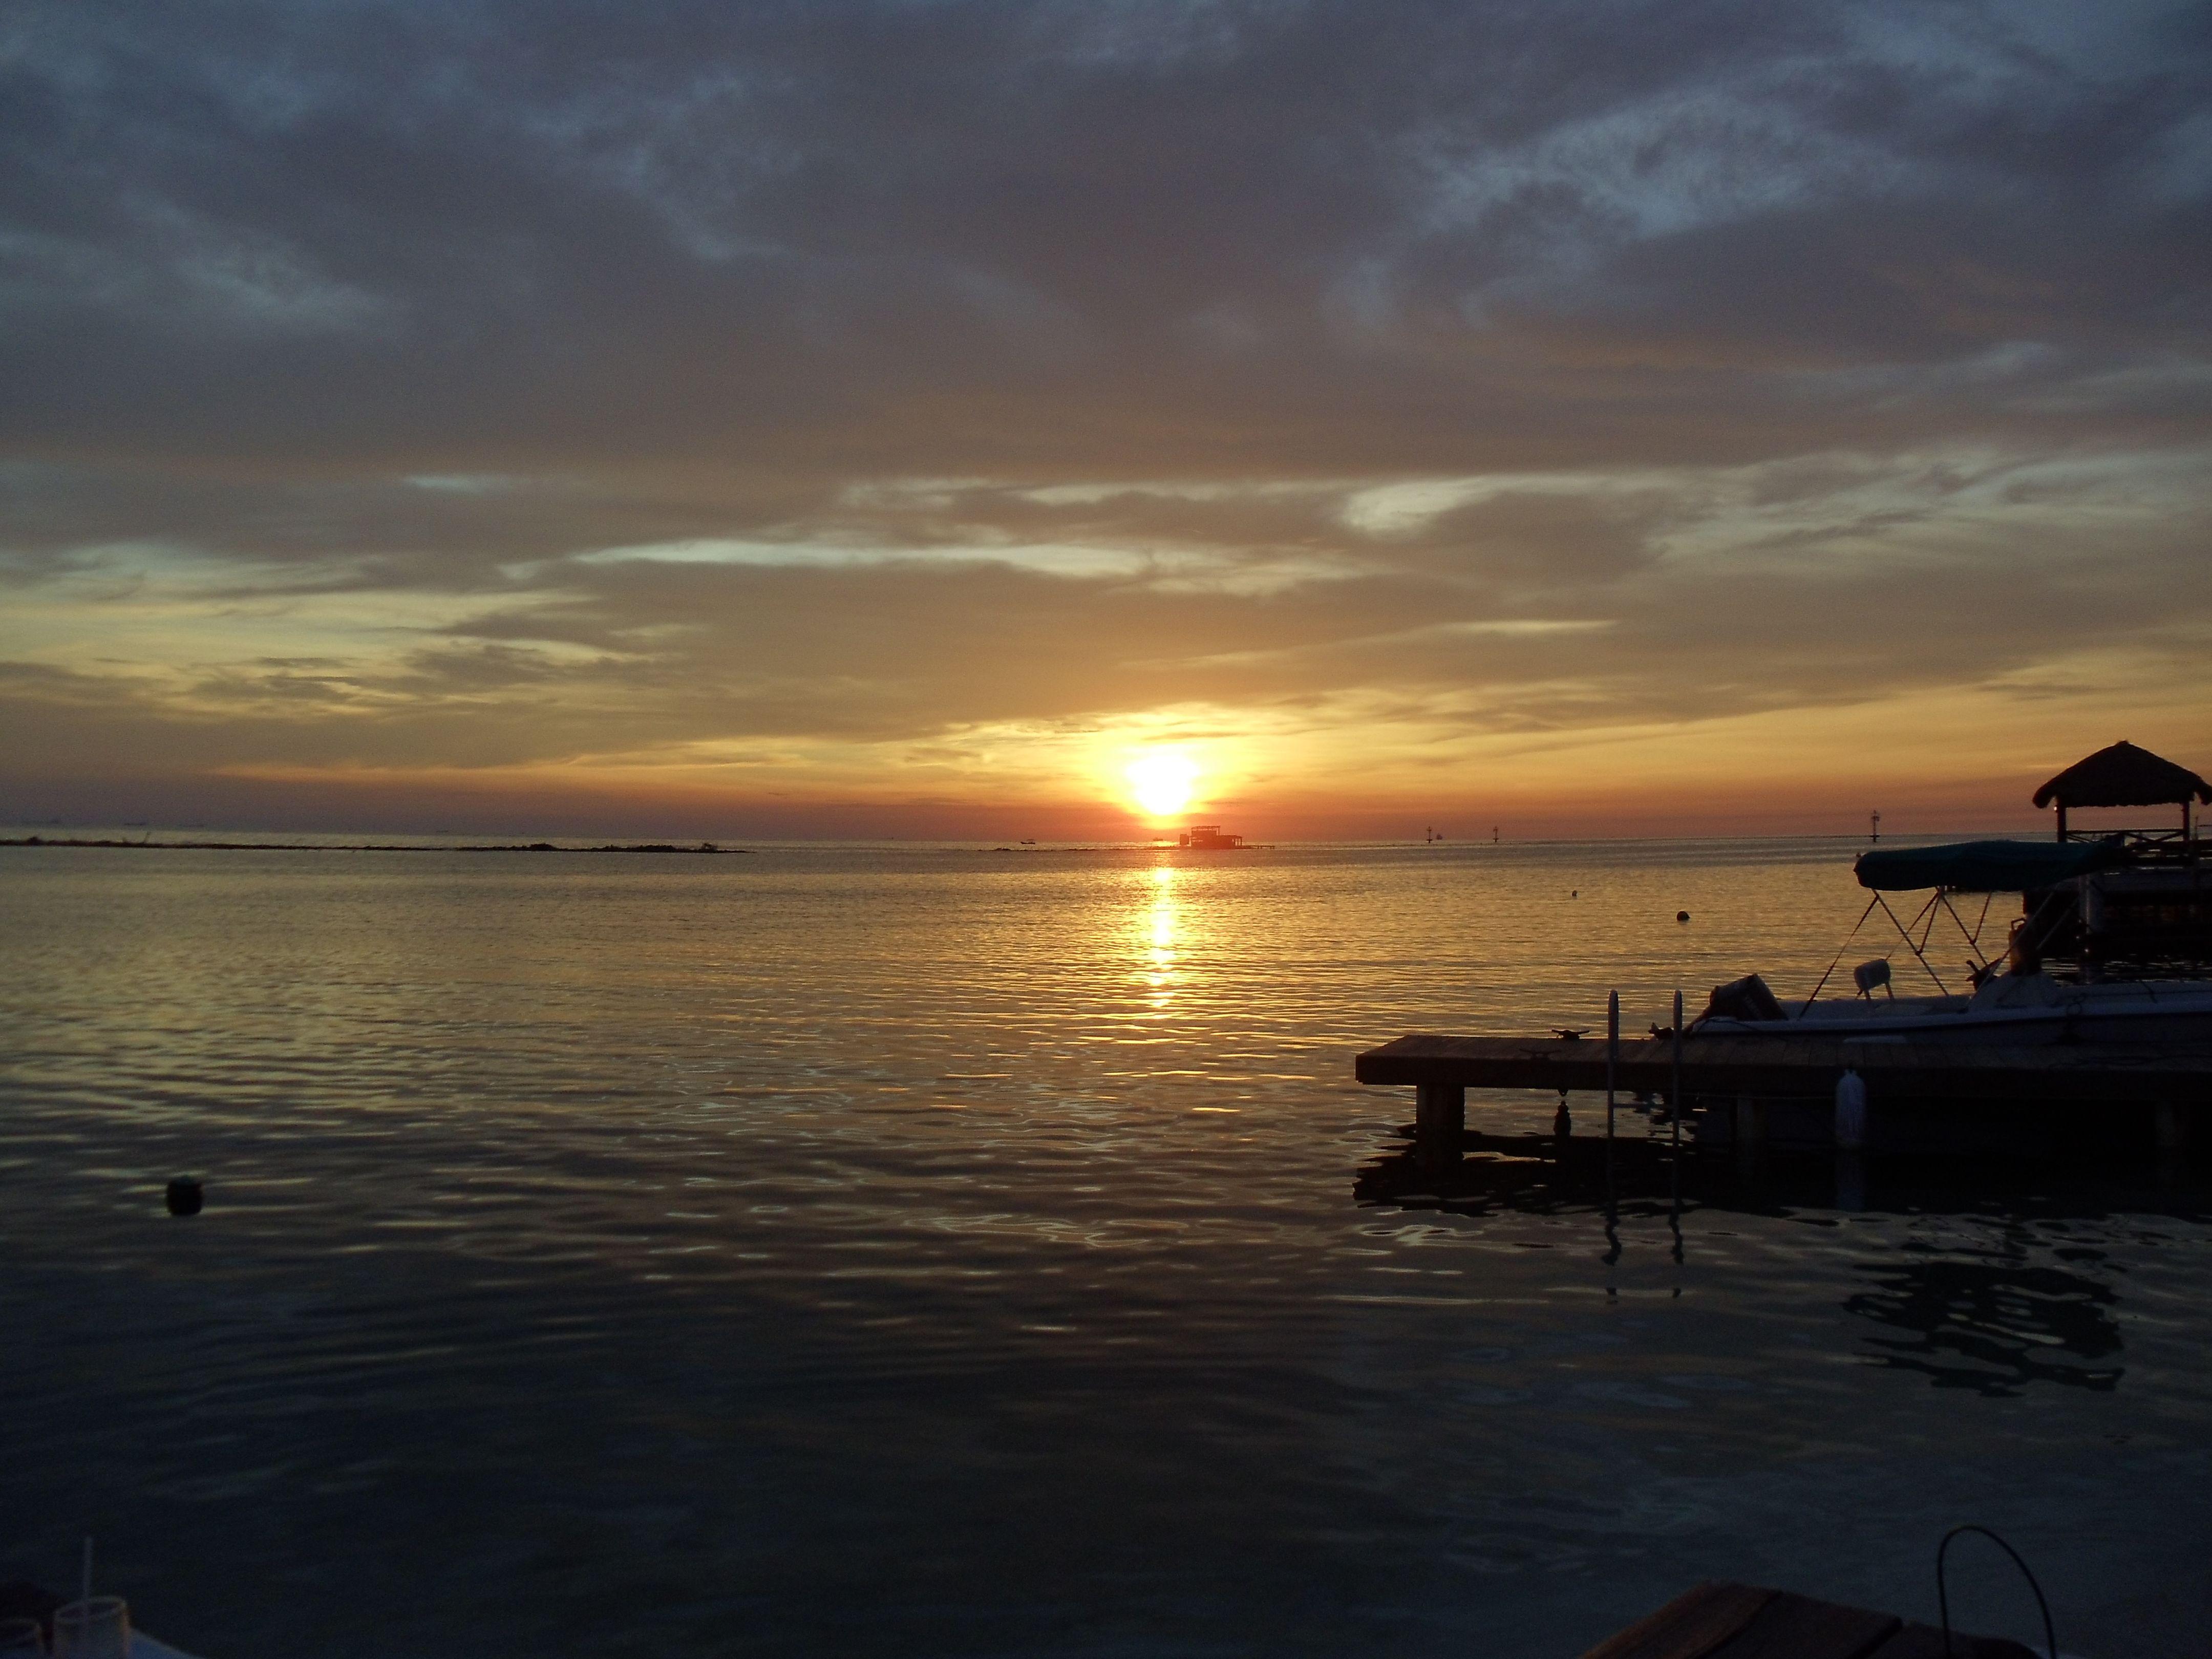 Sunset at Flying Fishbones - Aruba